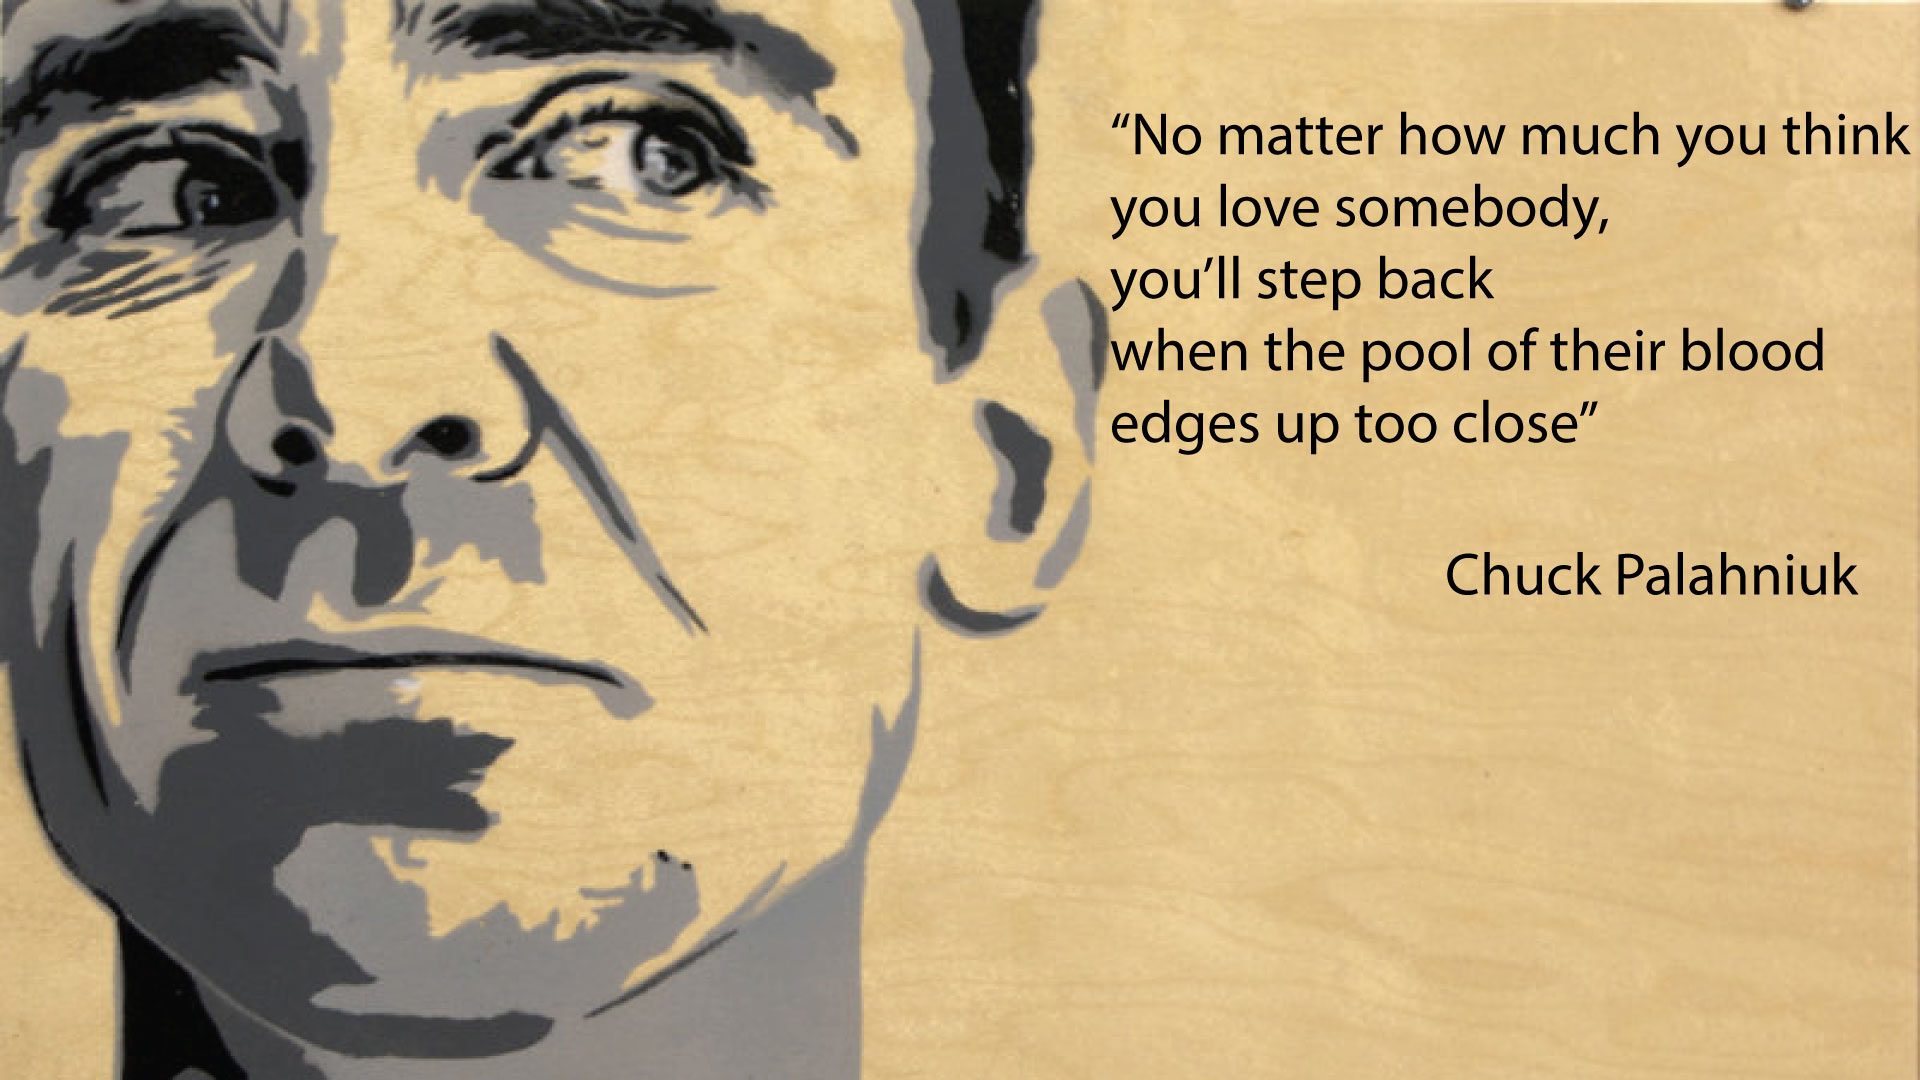 Chuck Palahniuk Invisible monsters i think Chuck palahniuk 1920x1080